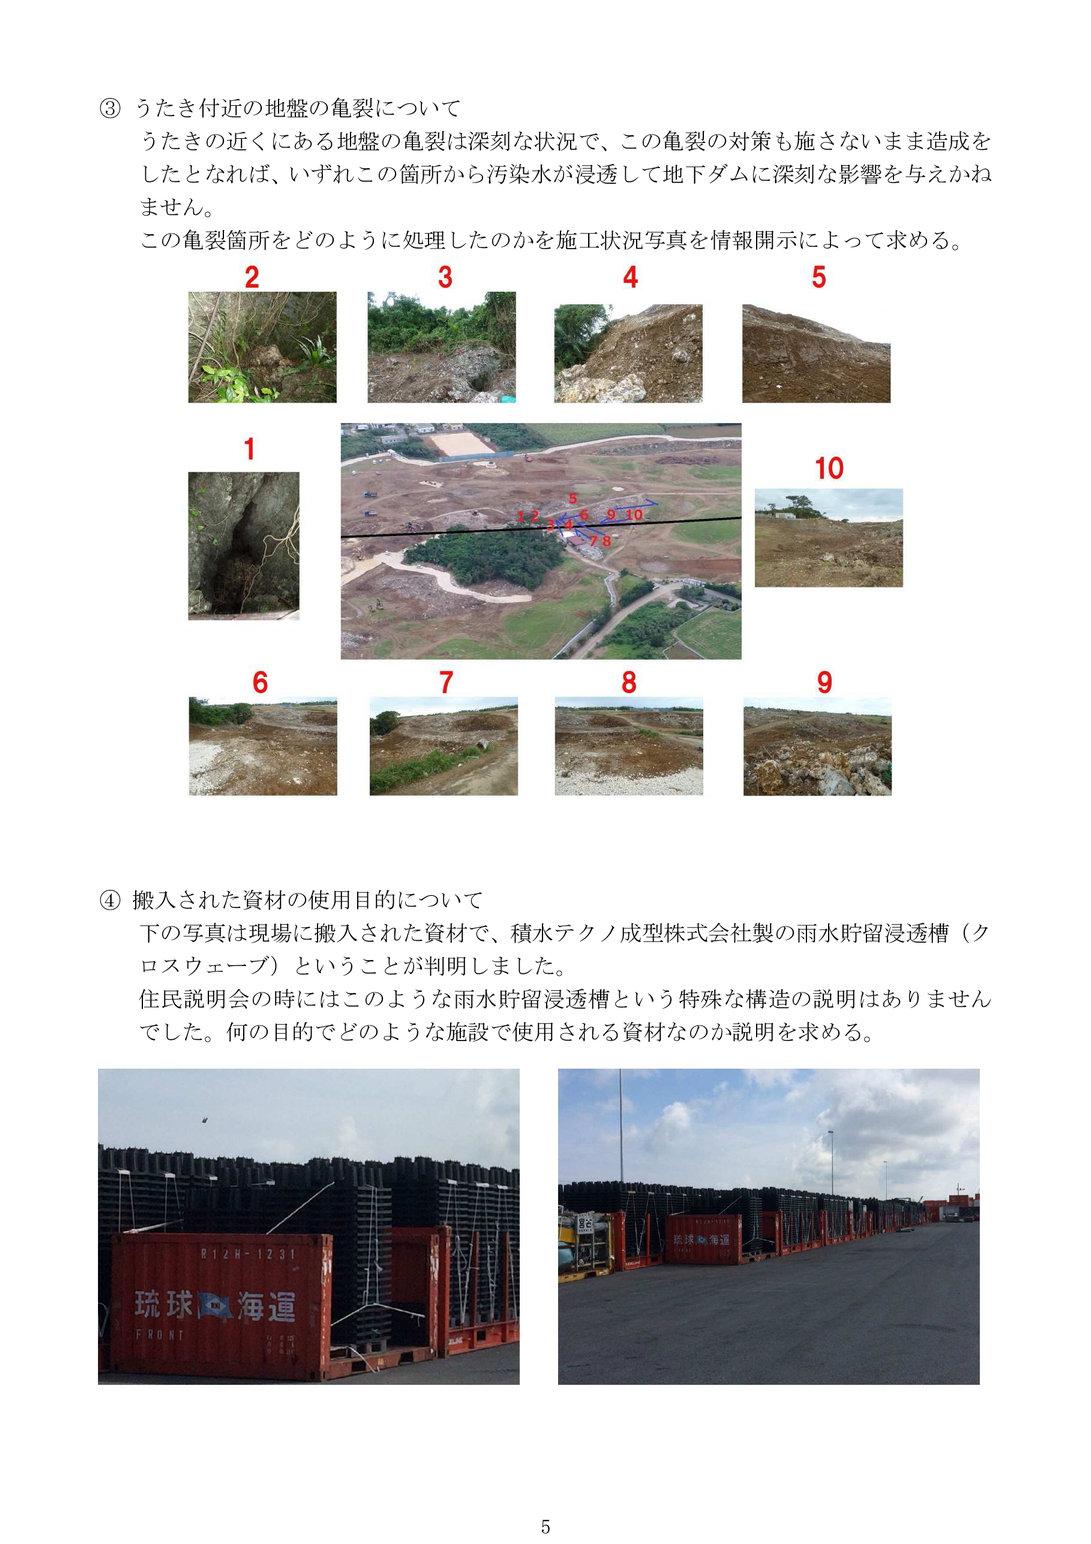 千代田地区工事の問題点06[1]